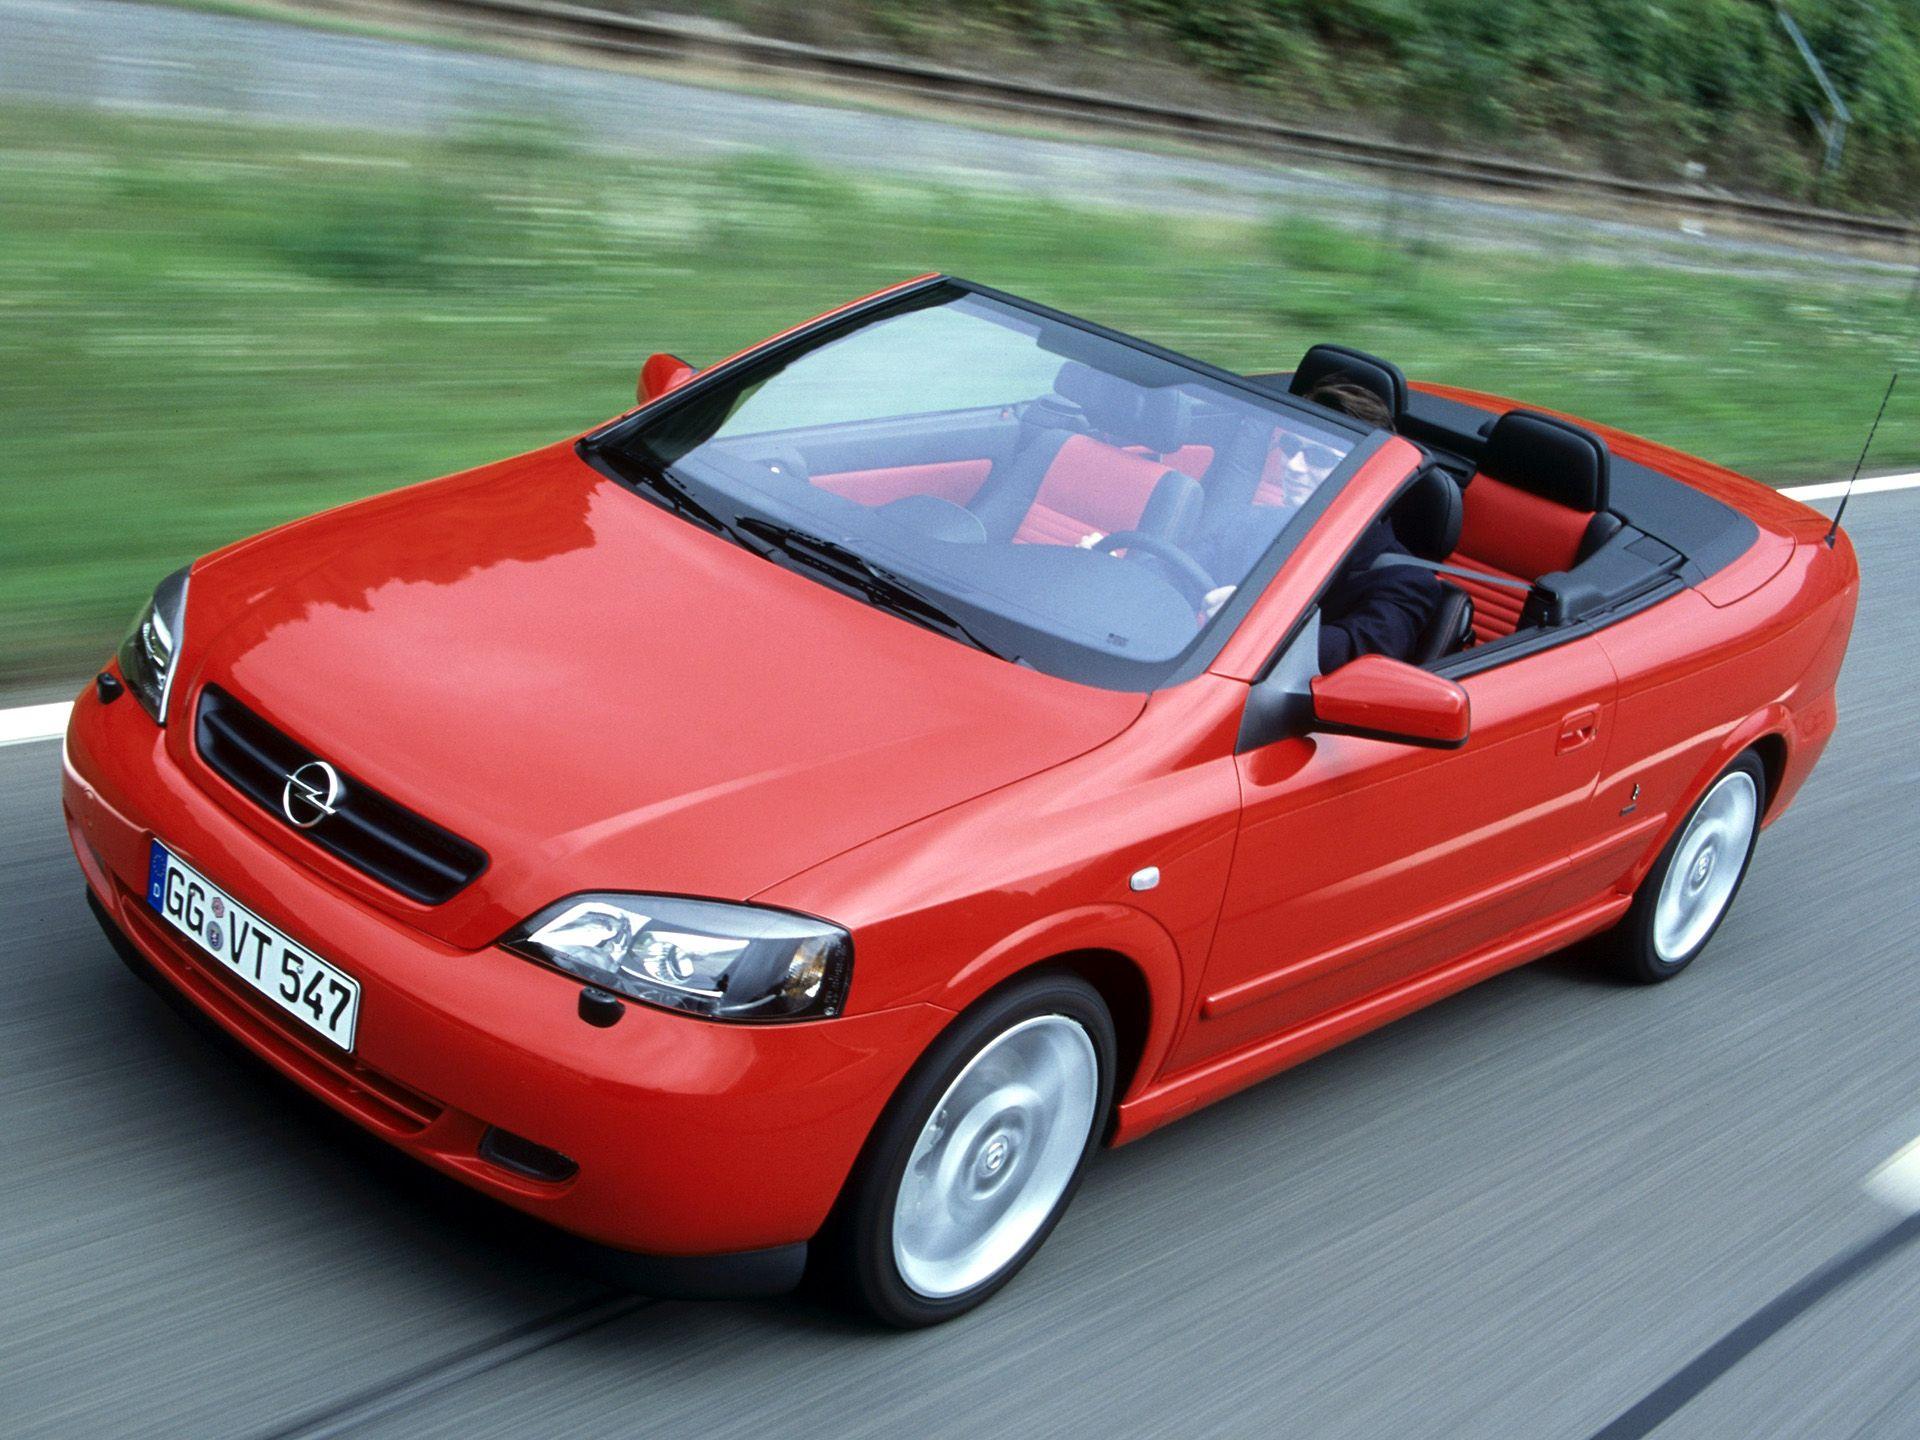 opel astra cabrio linea rossa g 39 2003 04 convertible cars pinterest cars. Black Bedroom Furniture Sets. Home Design Ideas